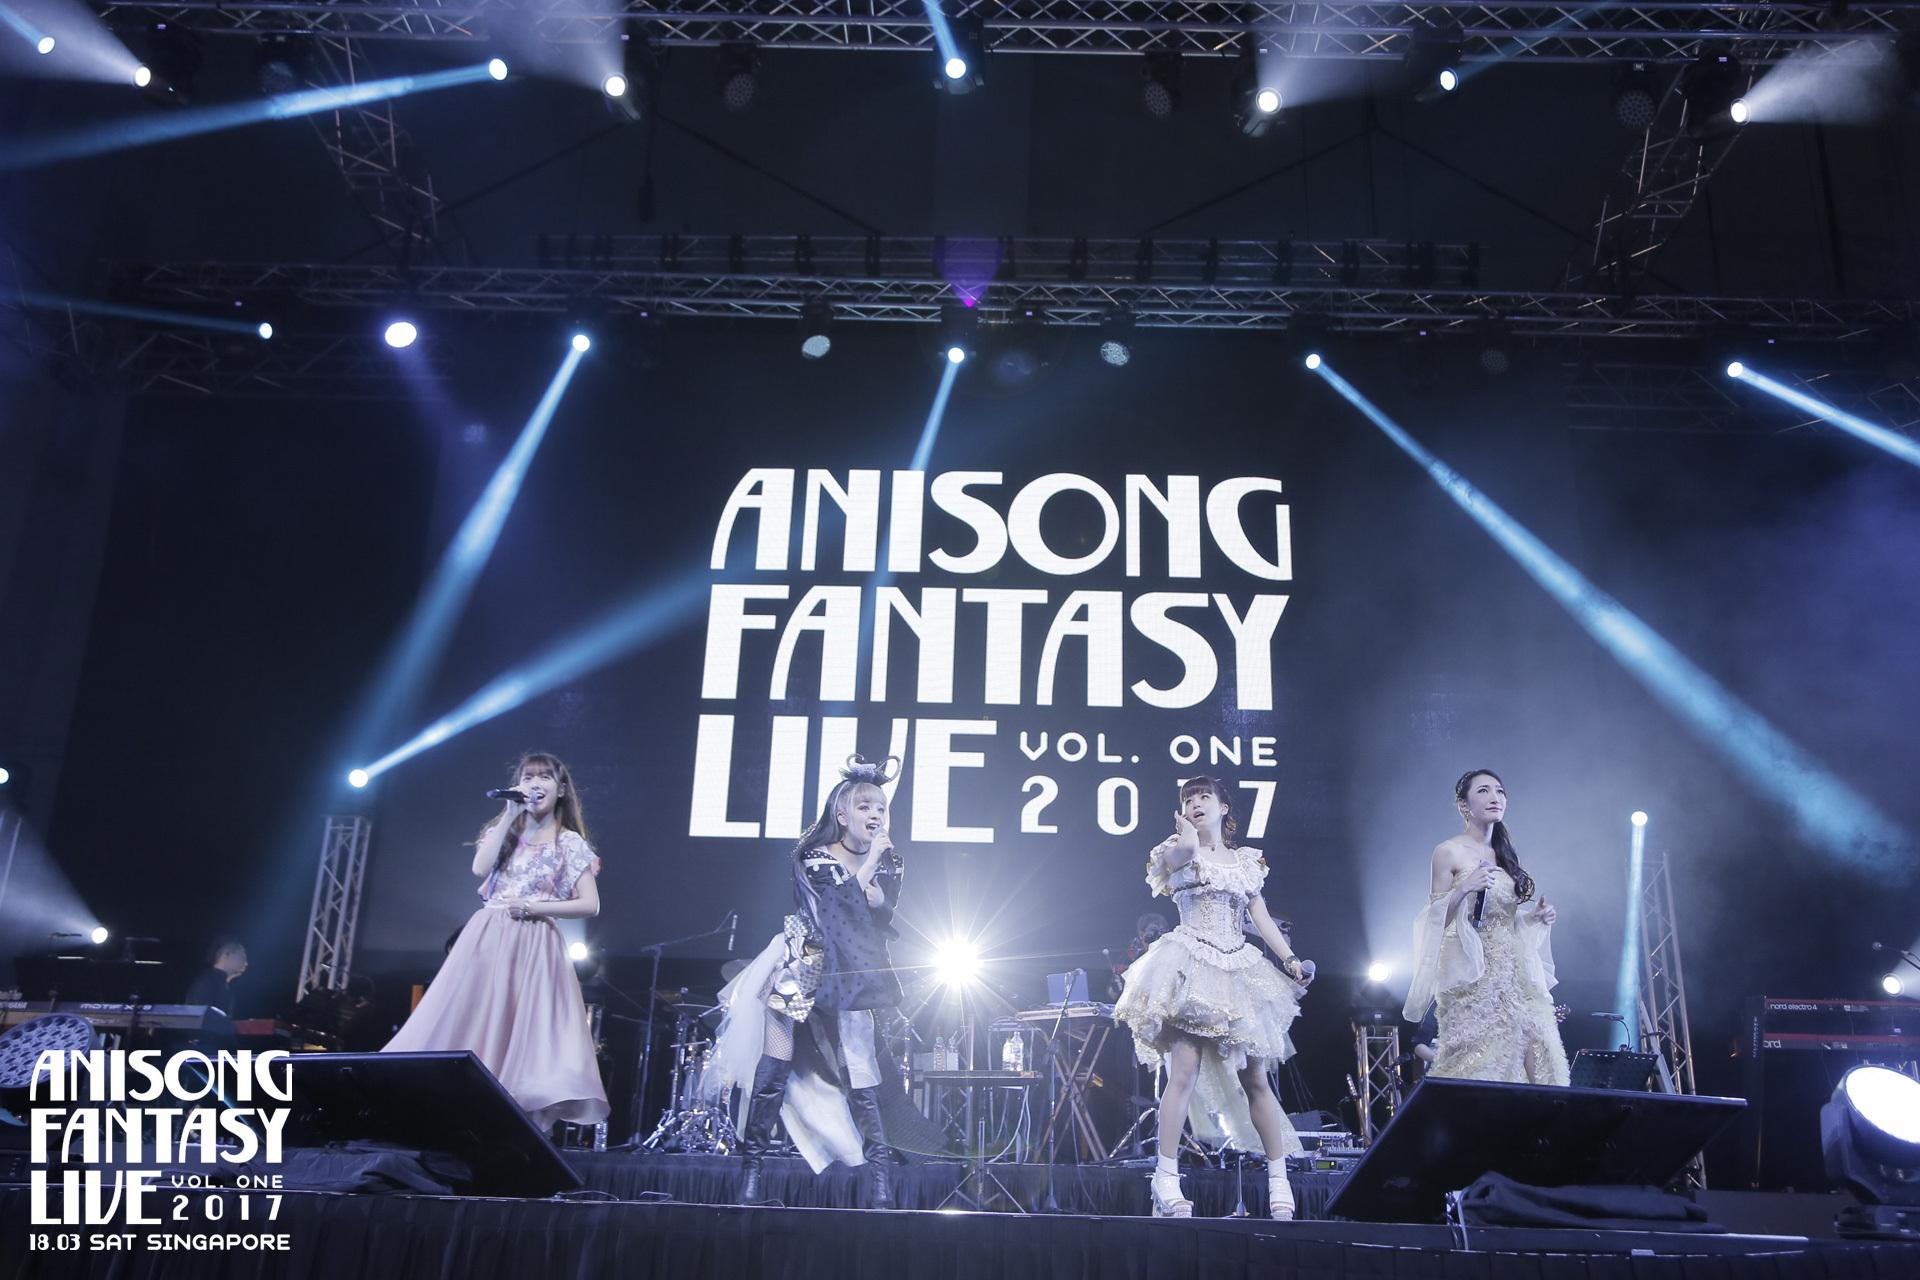 garnidelia luna haruna anisong fantasy live 2017 singapore